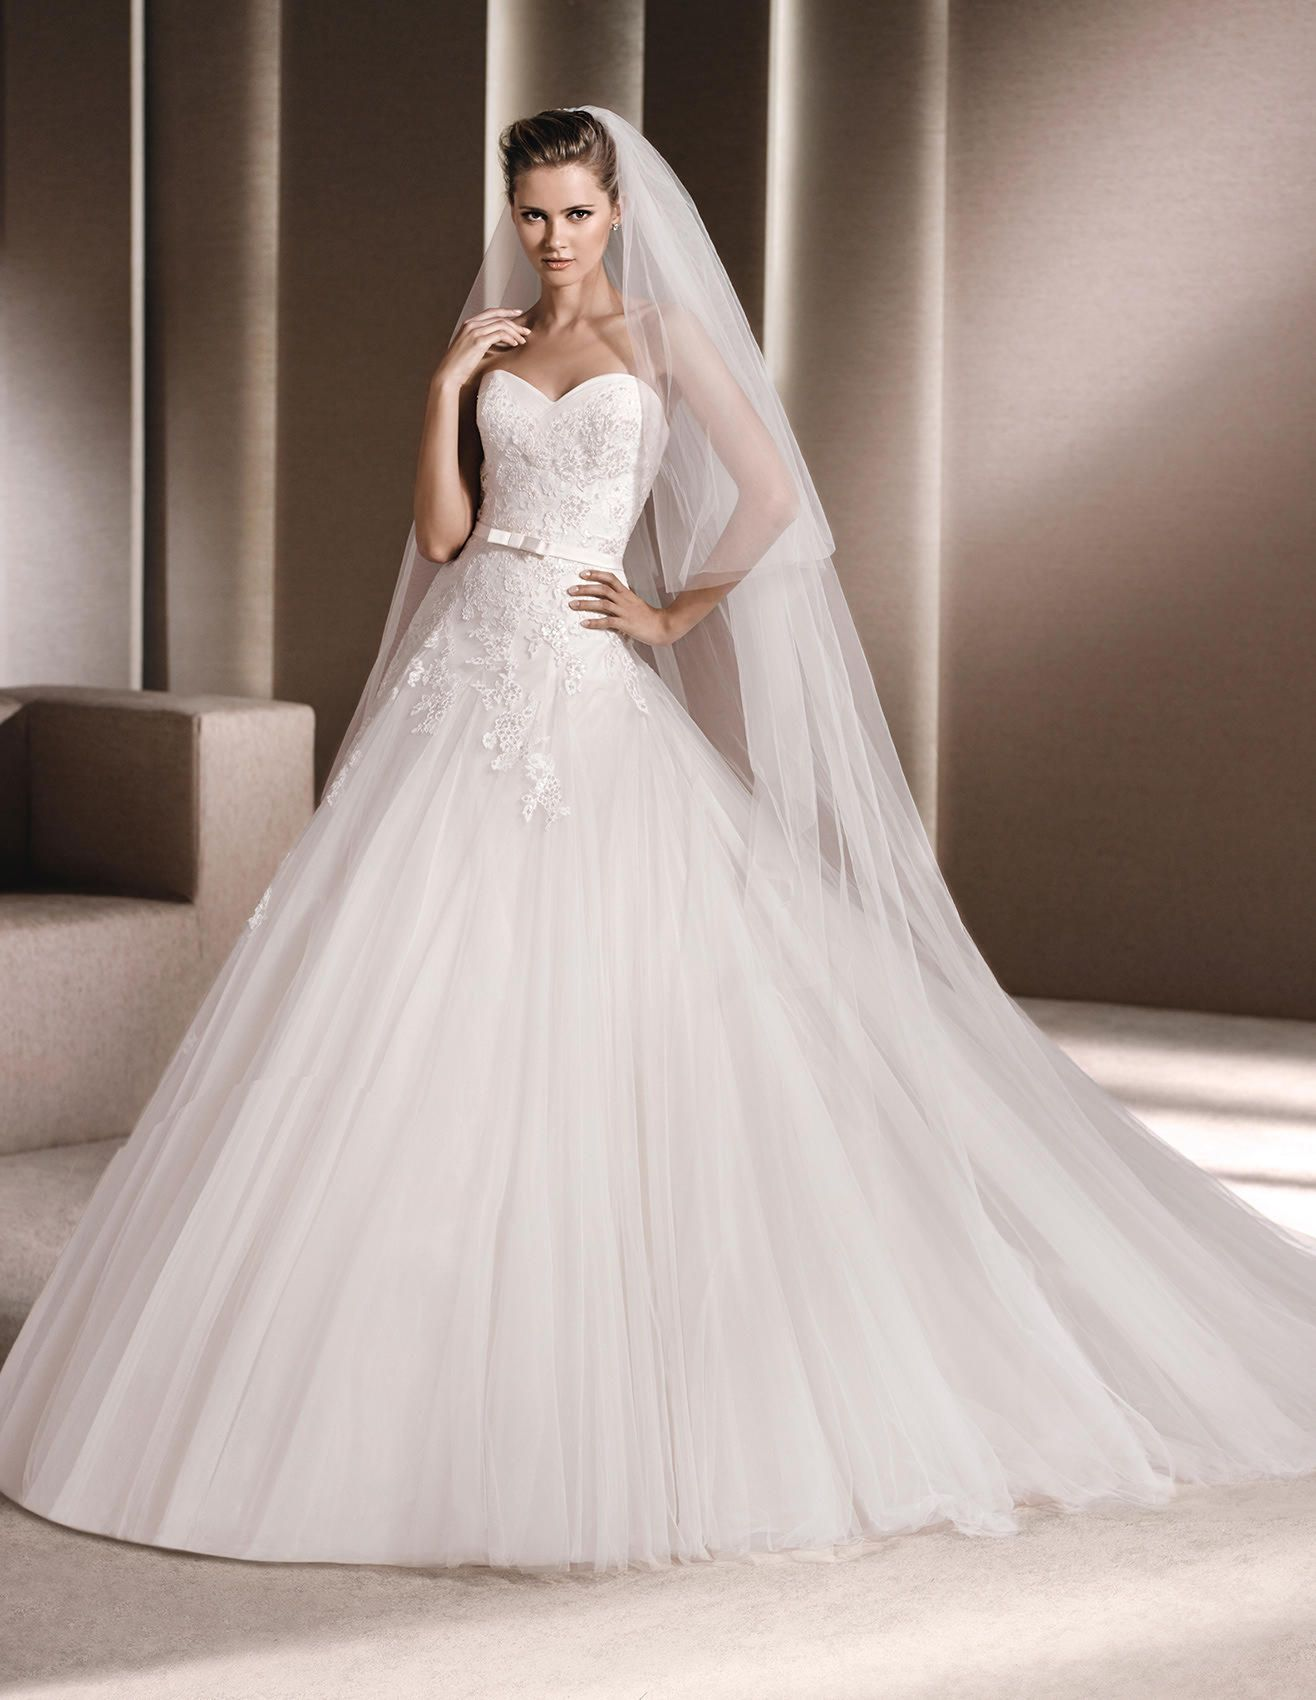 ILARIA - Princess wedding dress, in lace | La Sposa ...